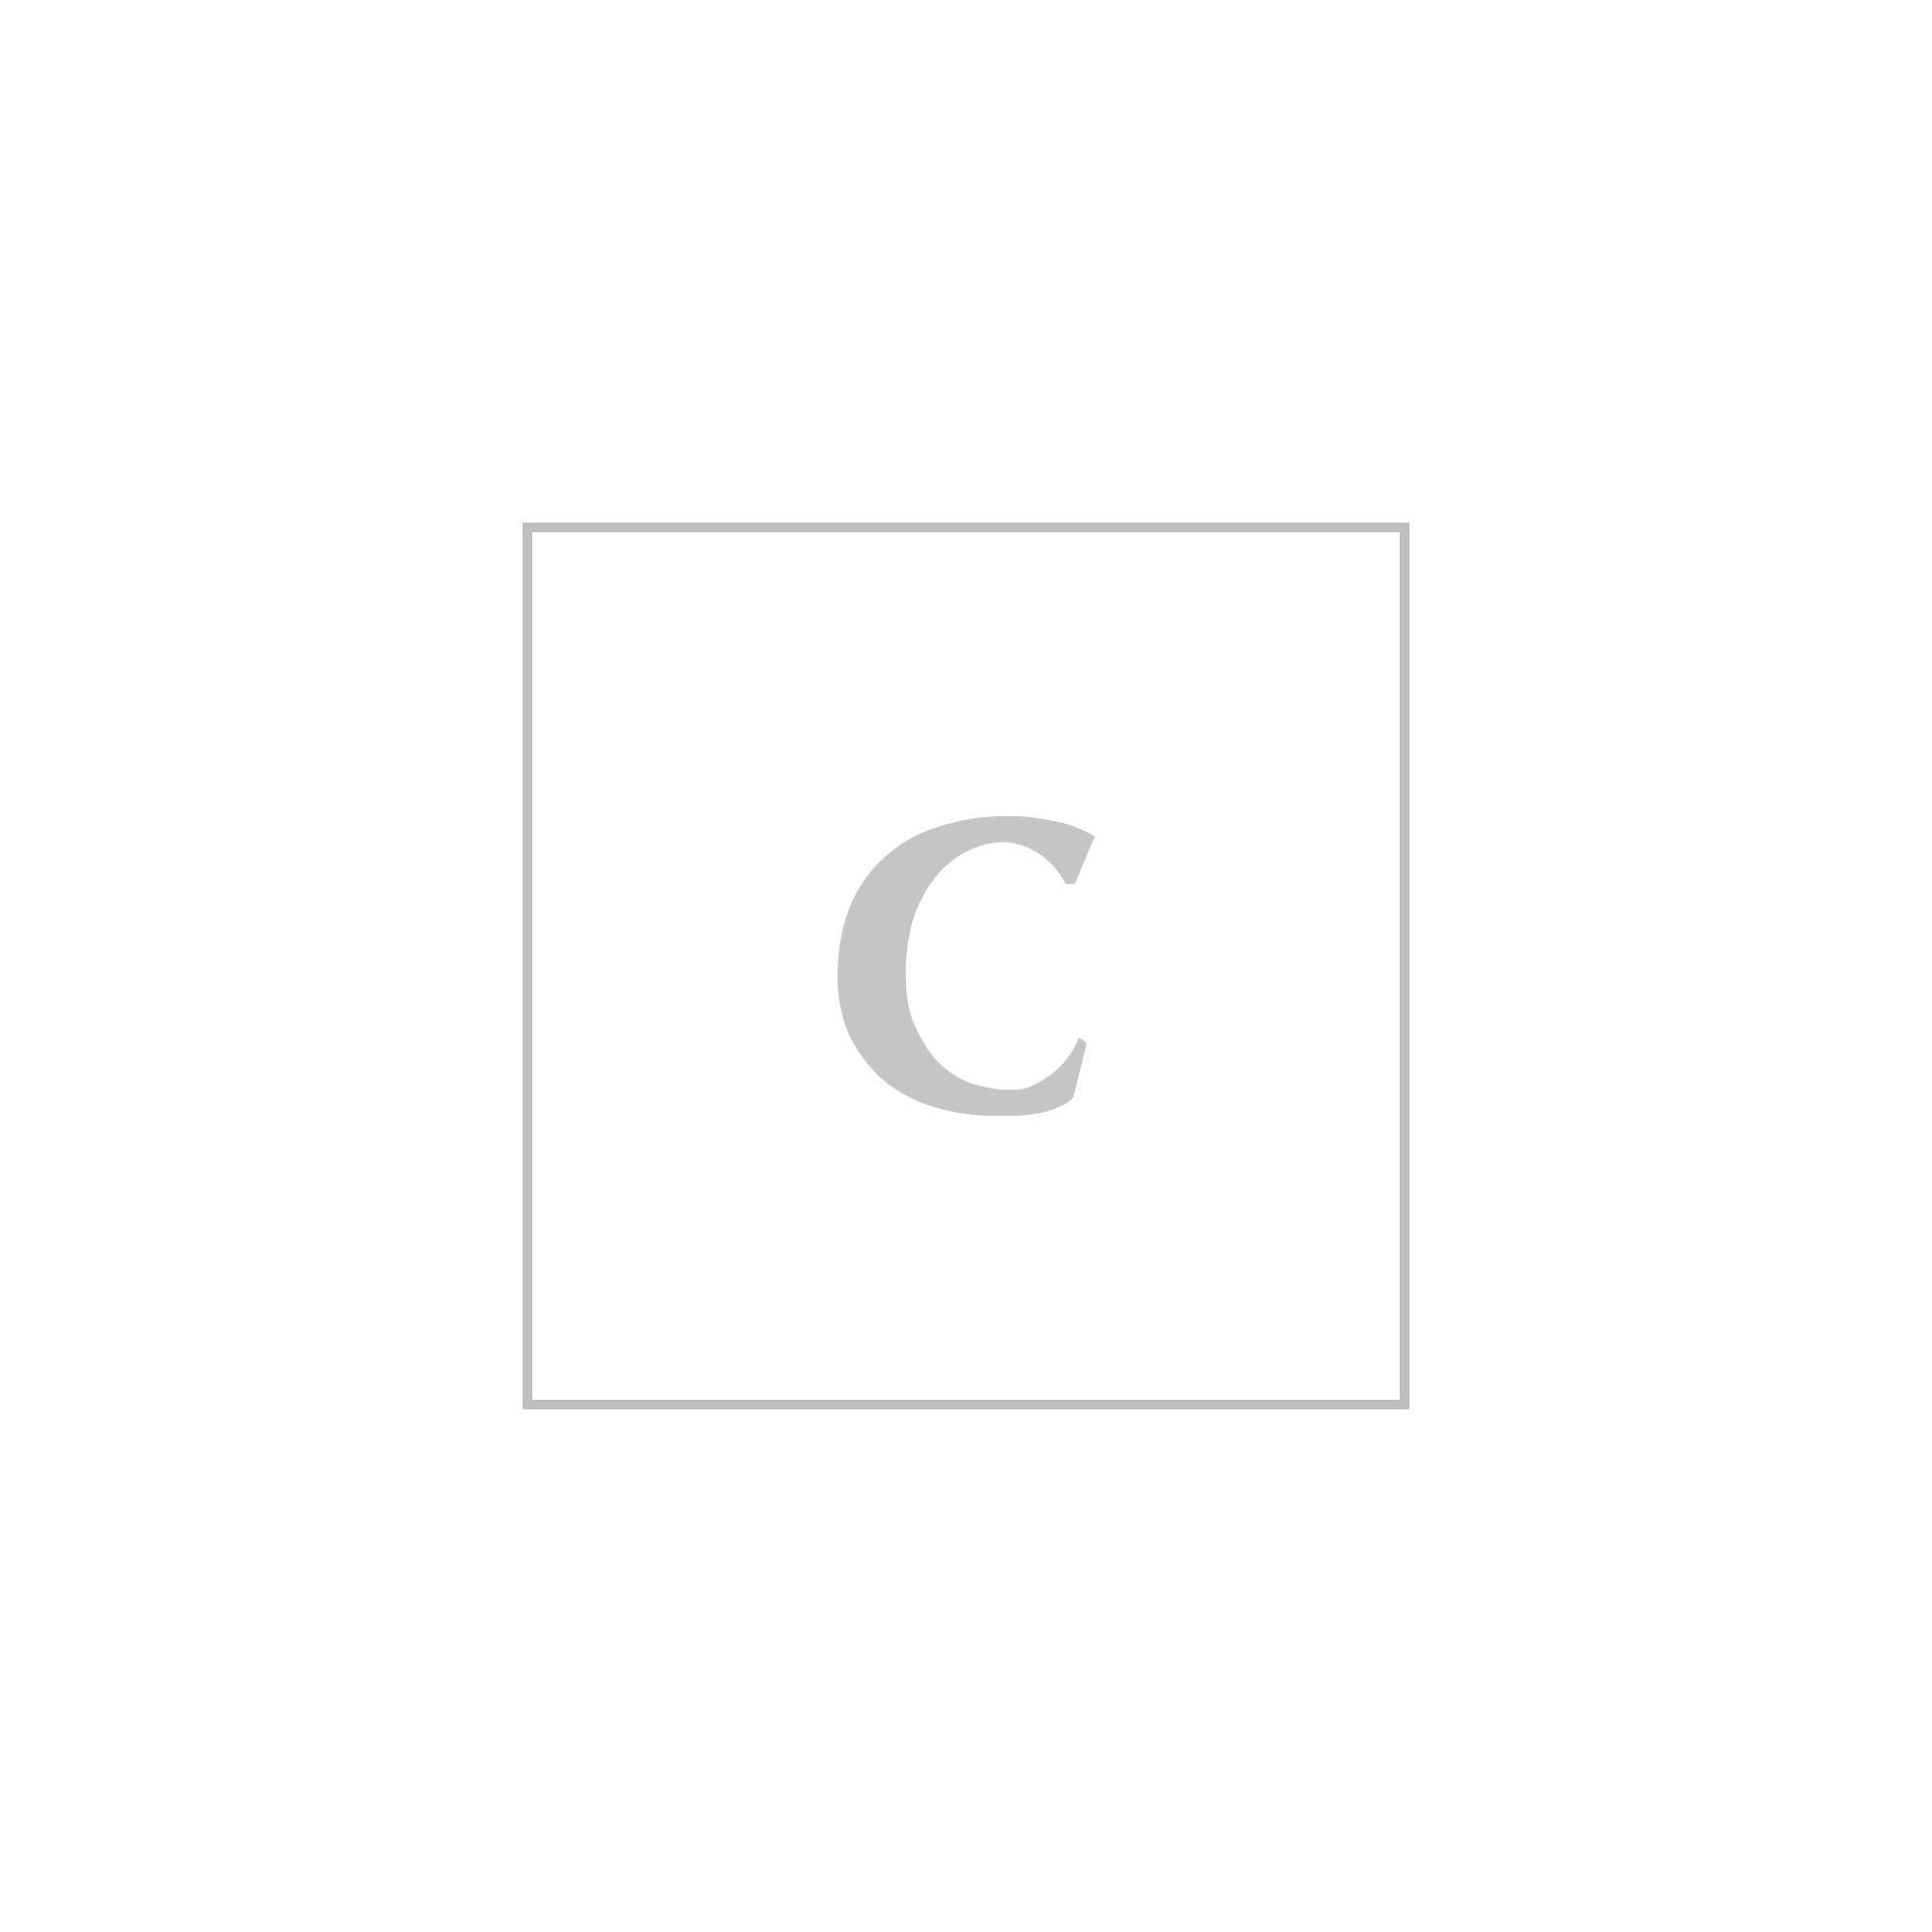 Saint laurent ysl borsa shopping con logo